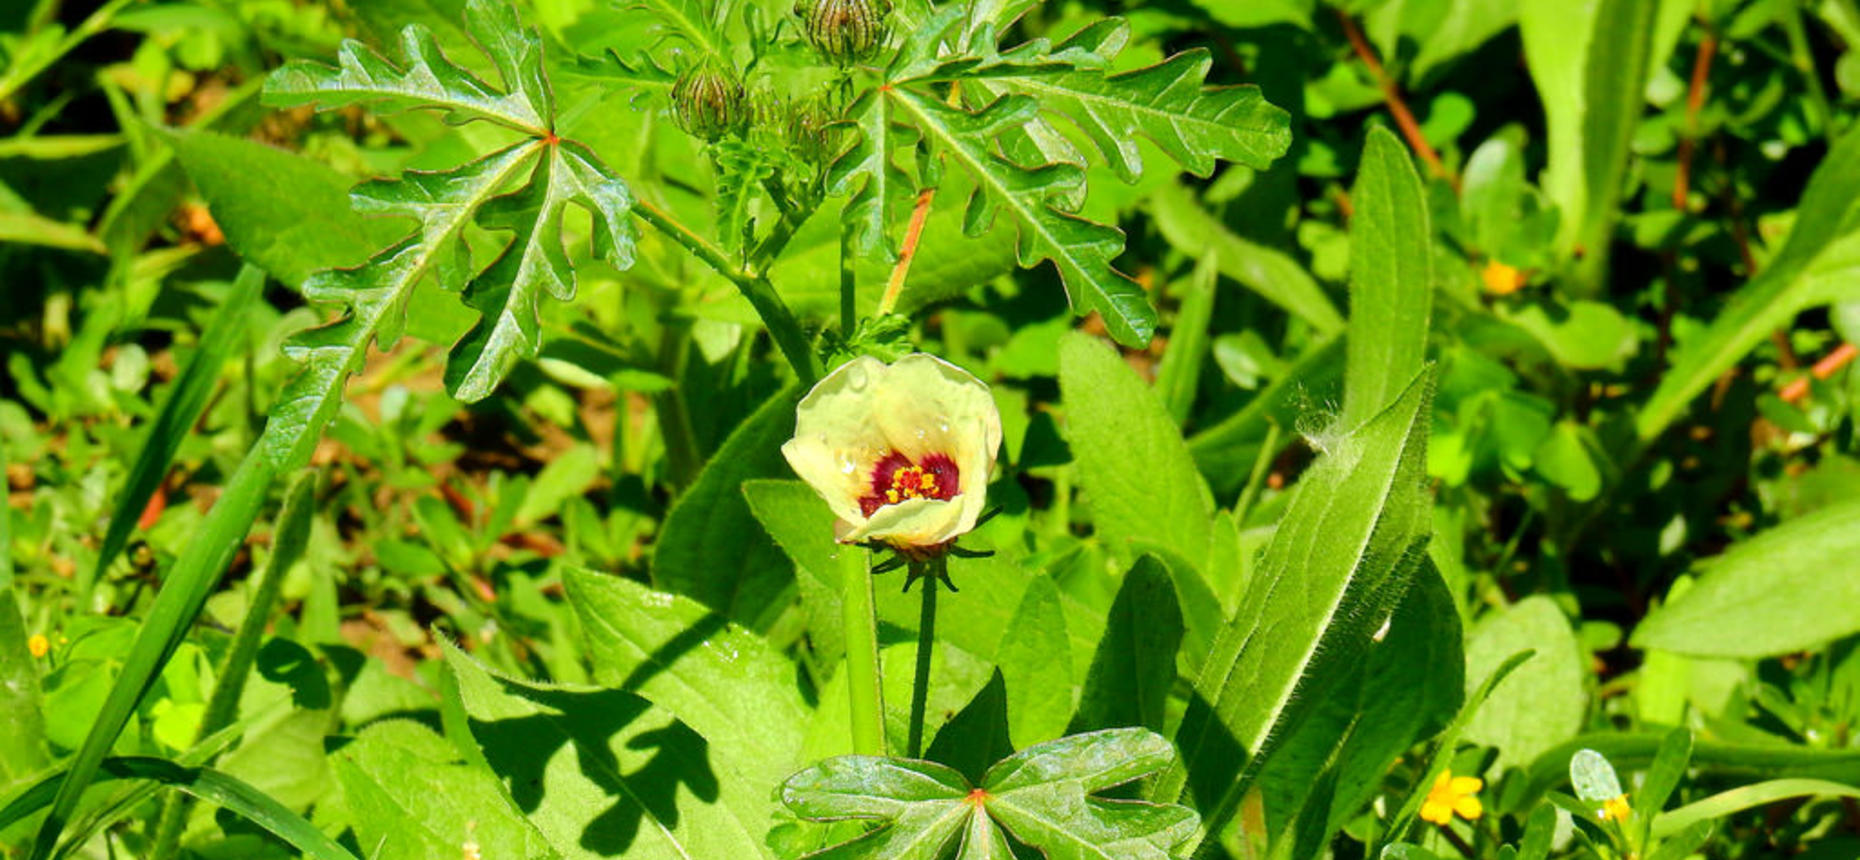 Hibiscus trionum L. - Гибискус тройчатый, вздутый